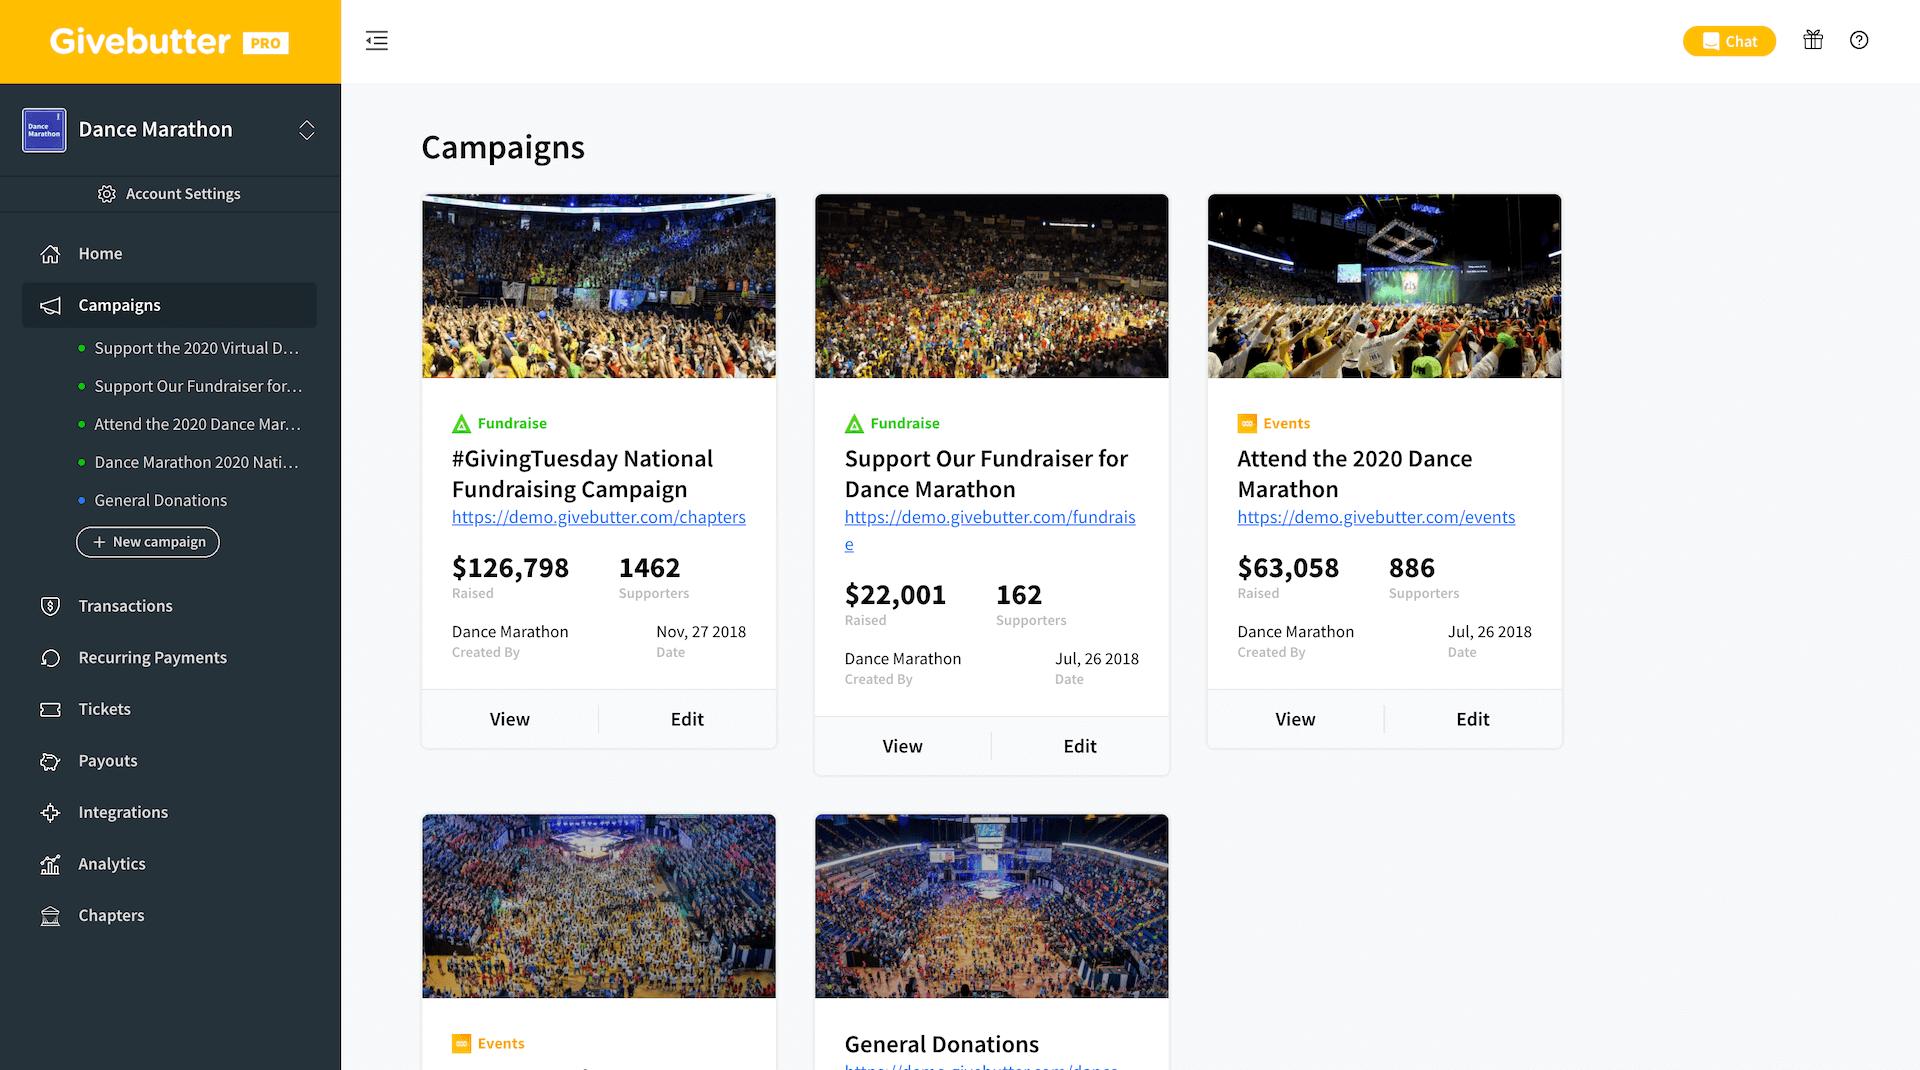 Givebutter Platform Campaigns Website Screenshot